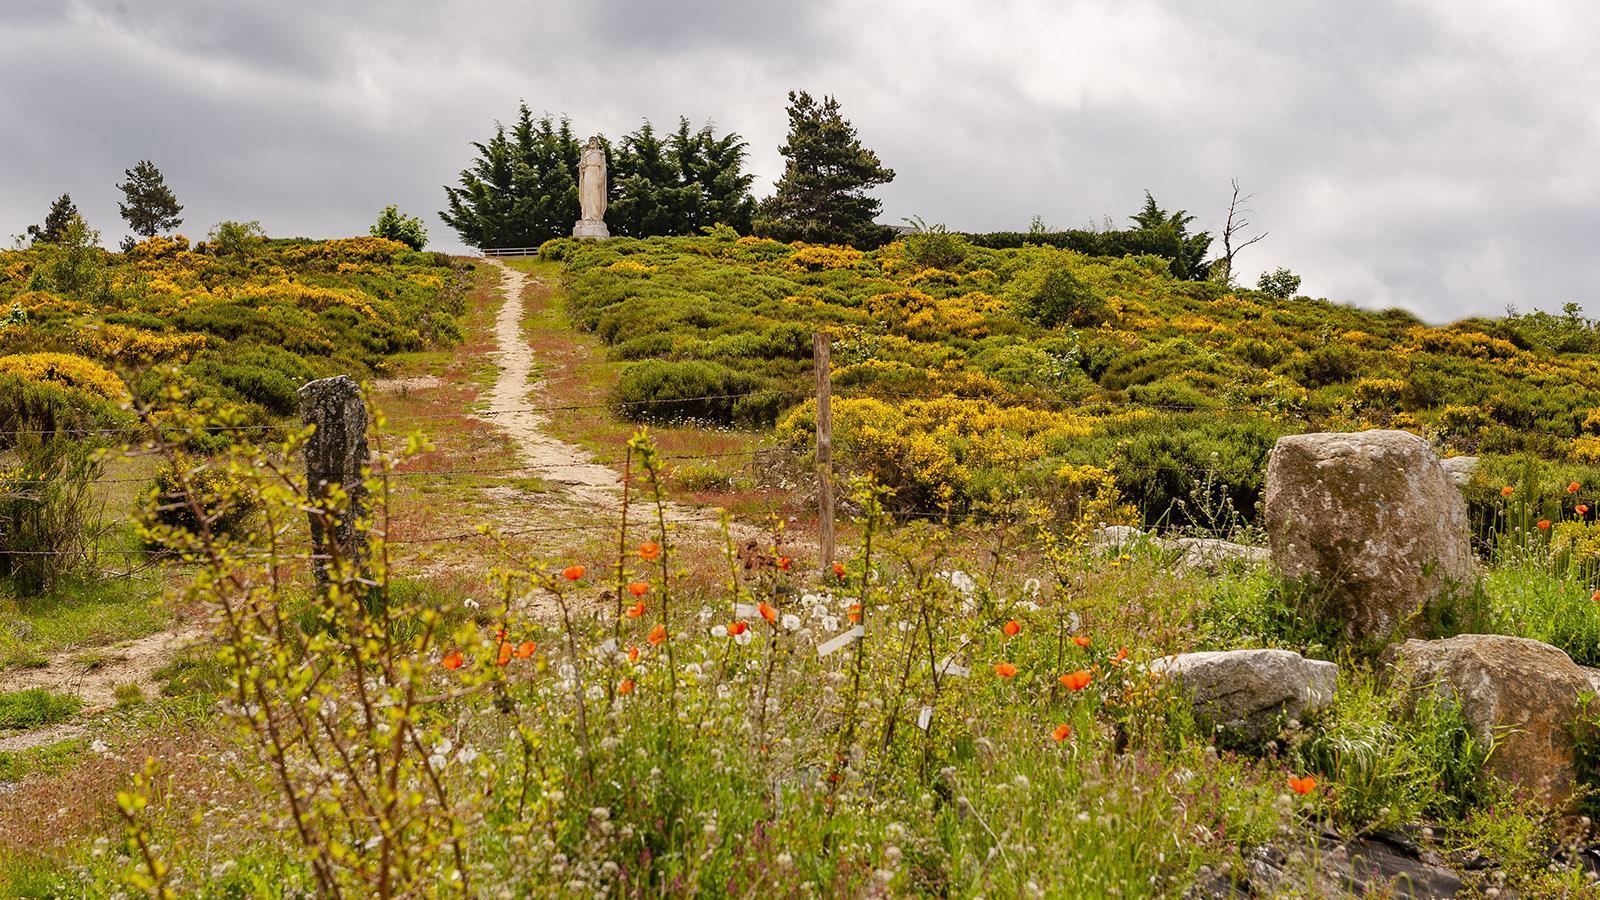 Aumont-Aubrac: Abgesperrt - der Weg zur Statue. Foto: Hilke Maunder